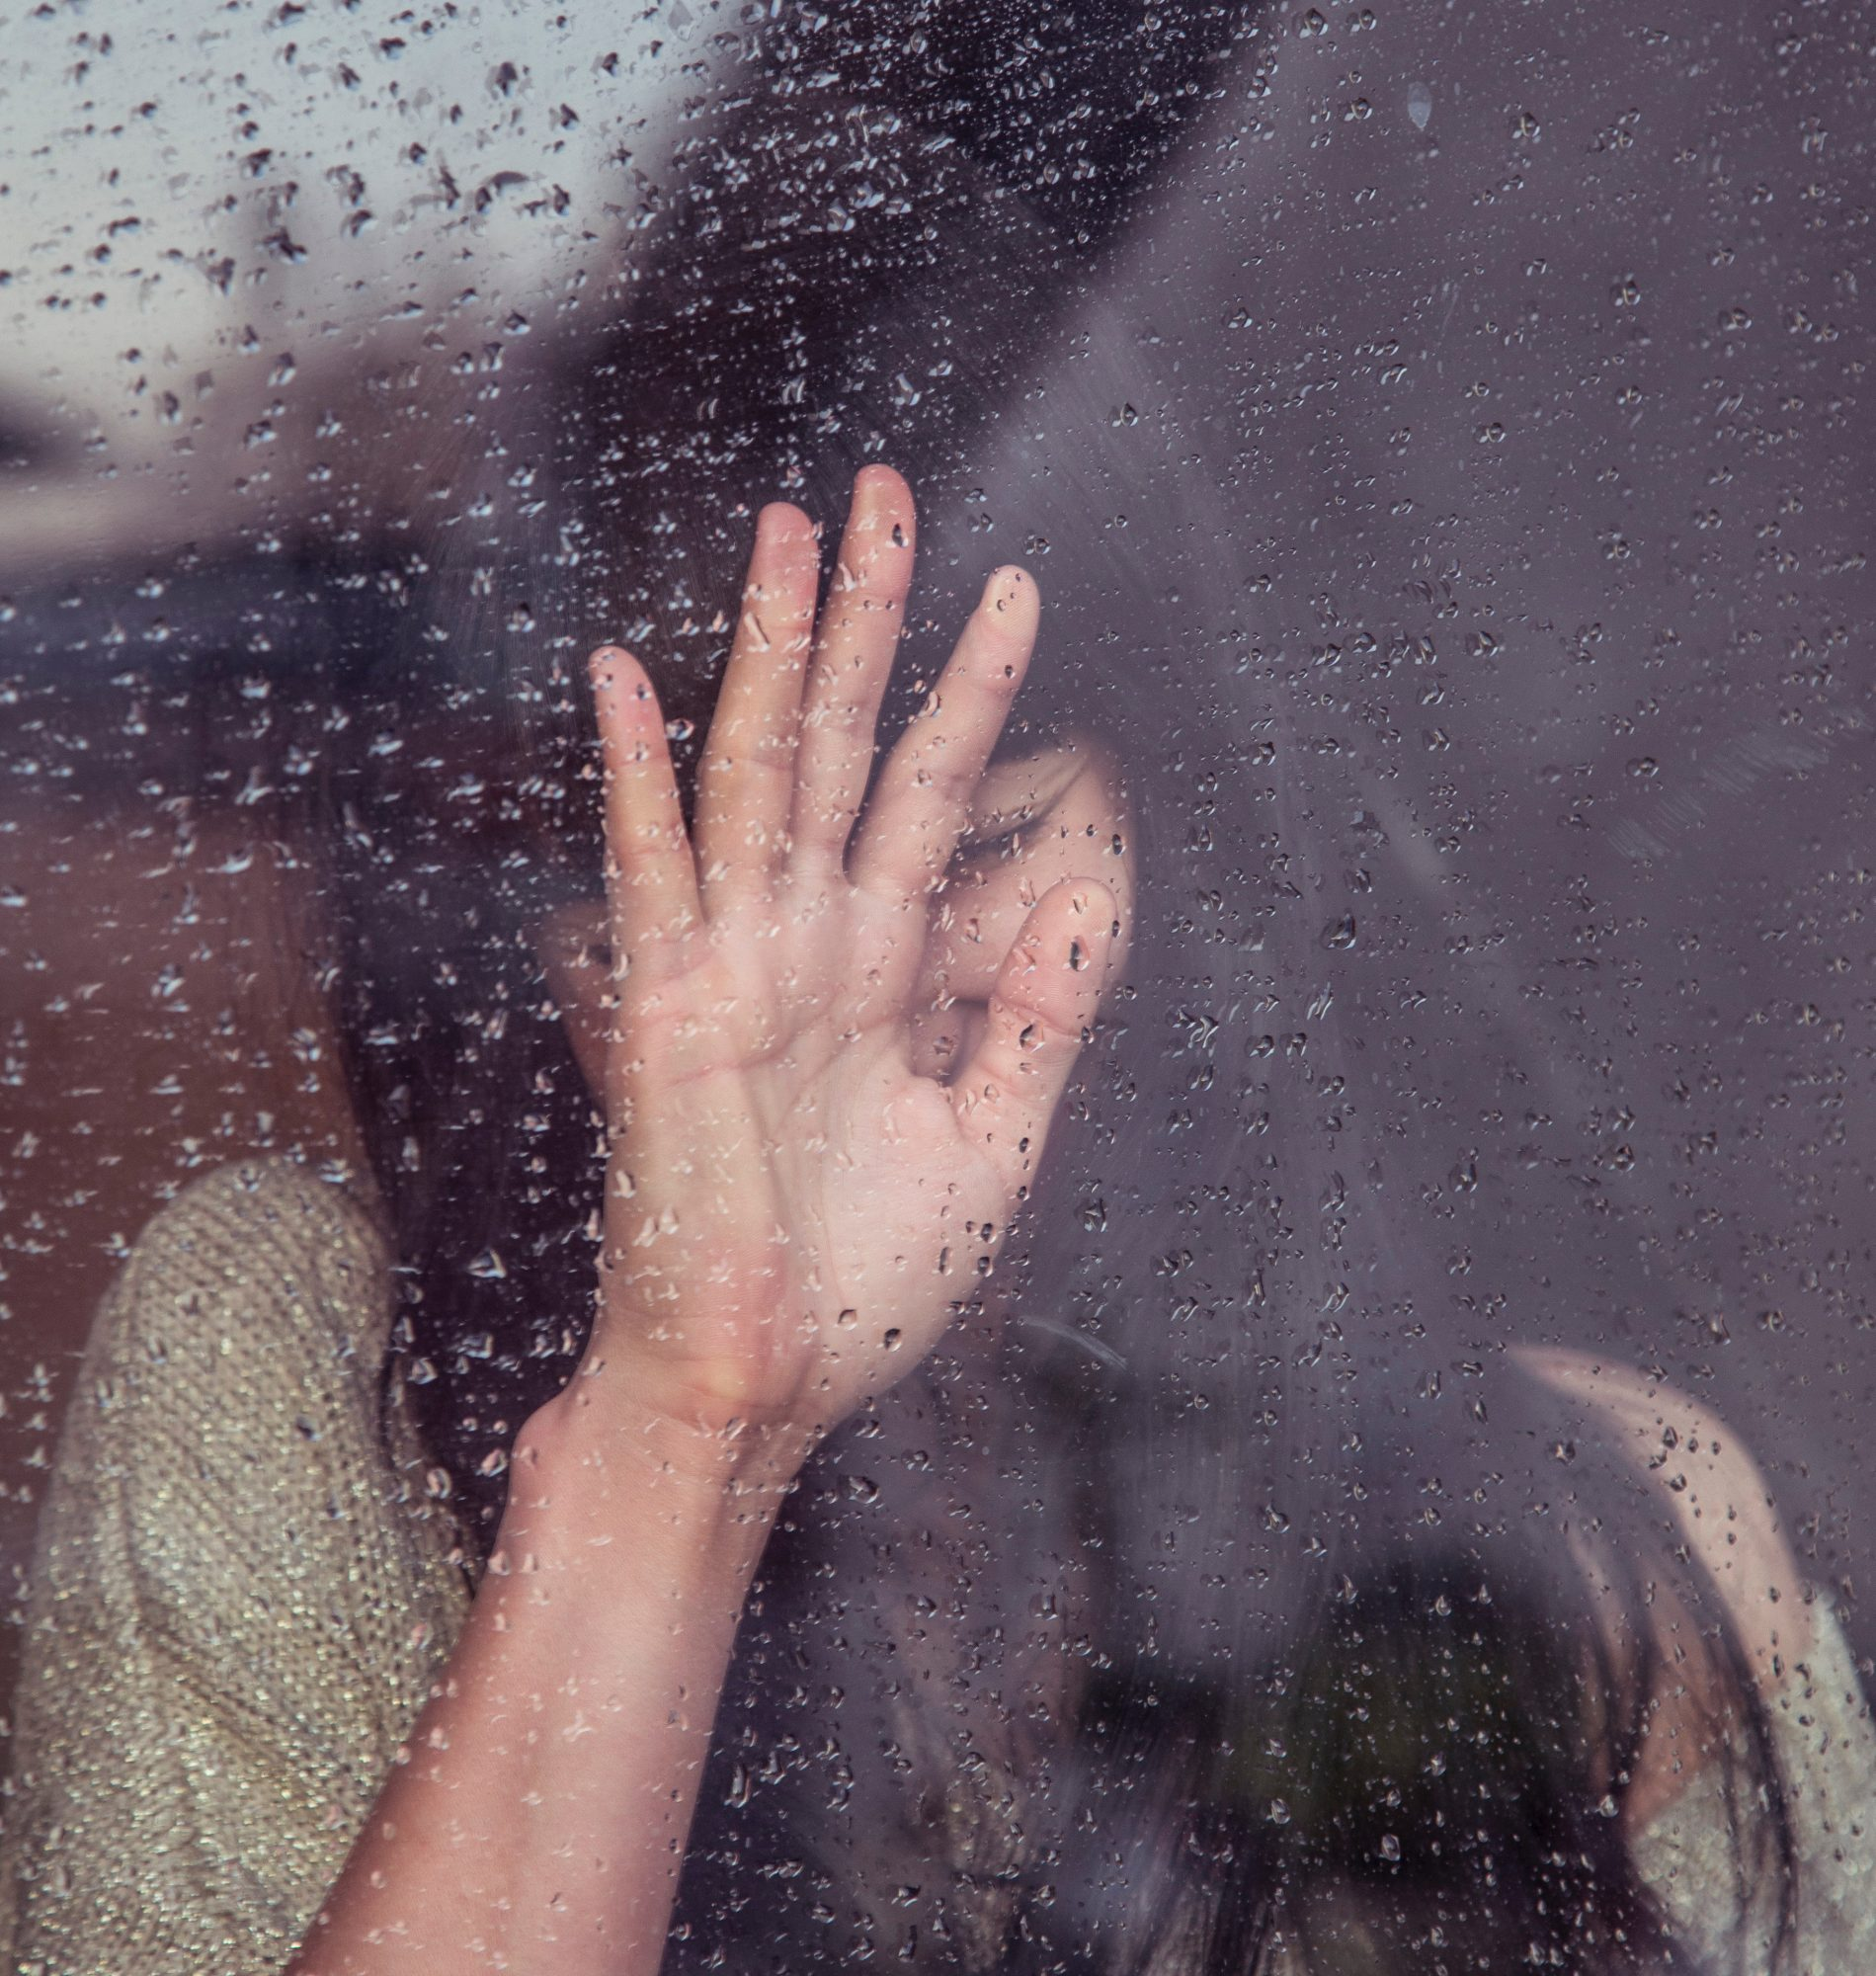 sad-depressed-woman-window